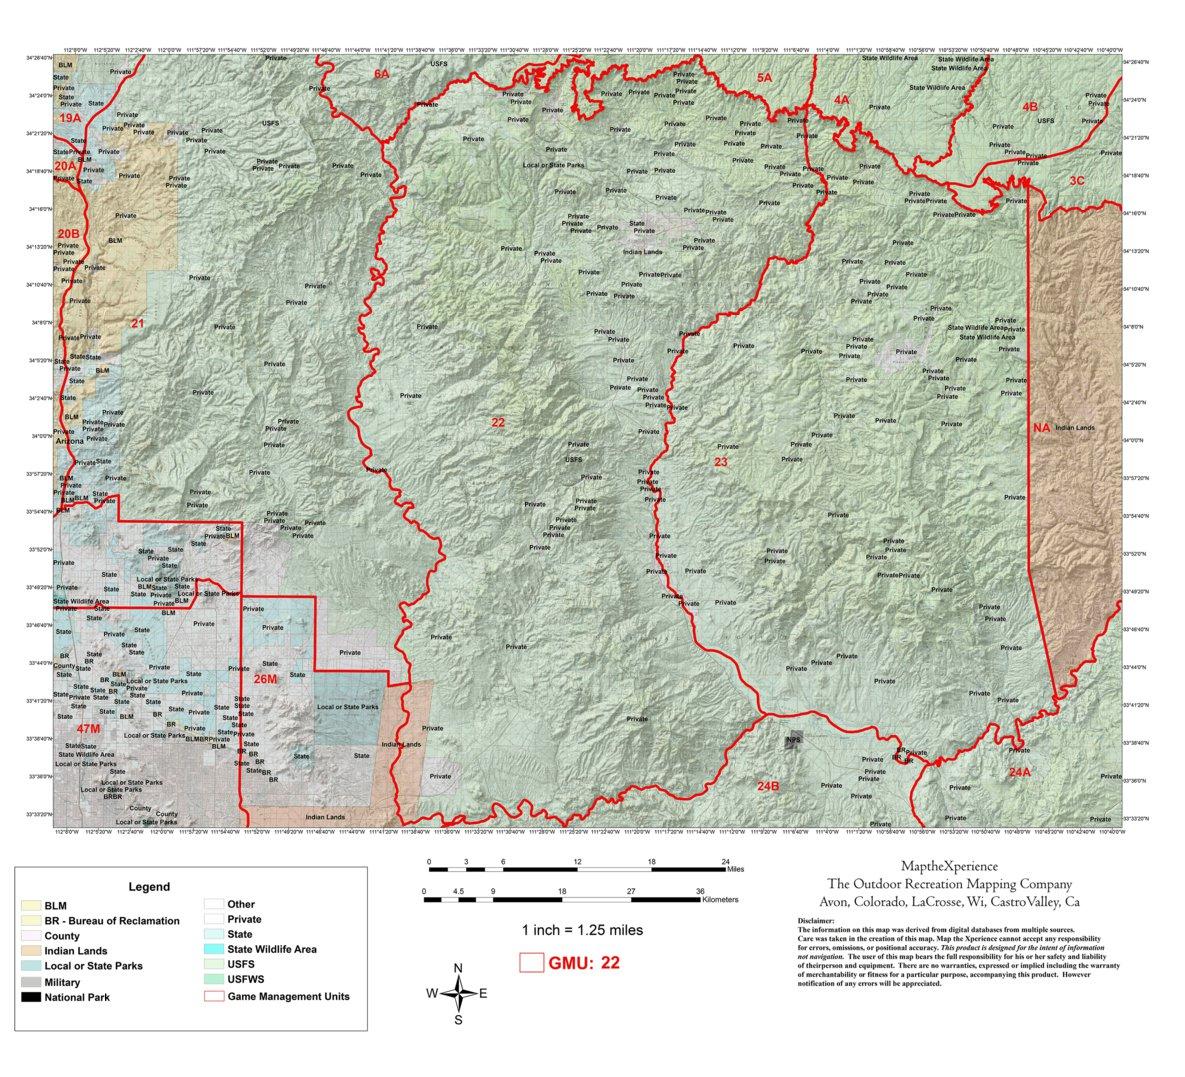 North Arizona Map.Arizona Gmu 22 Hunting Map Map The Xperience Avenza Maps